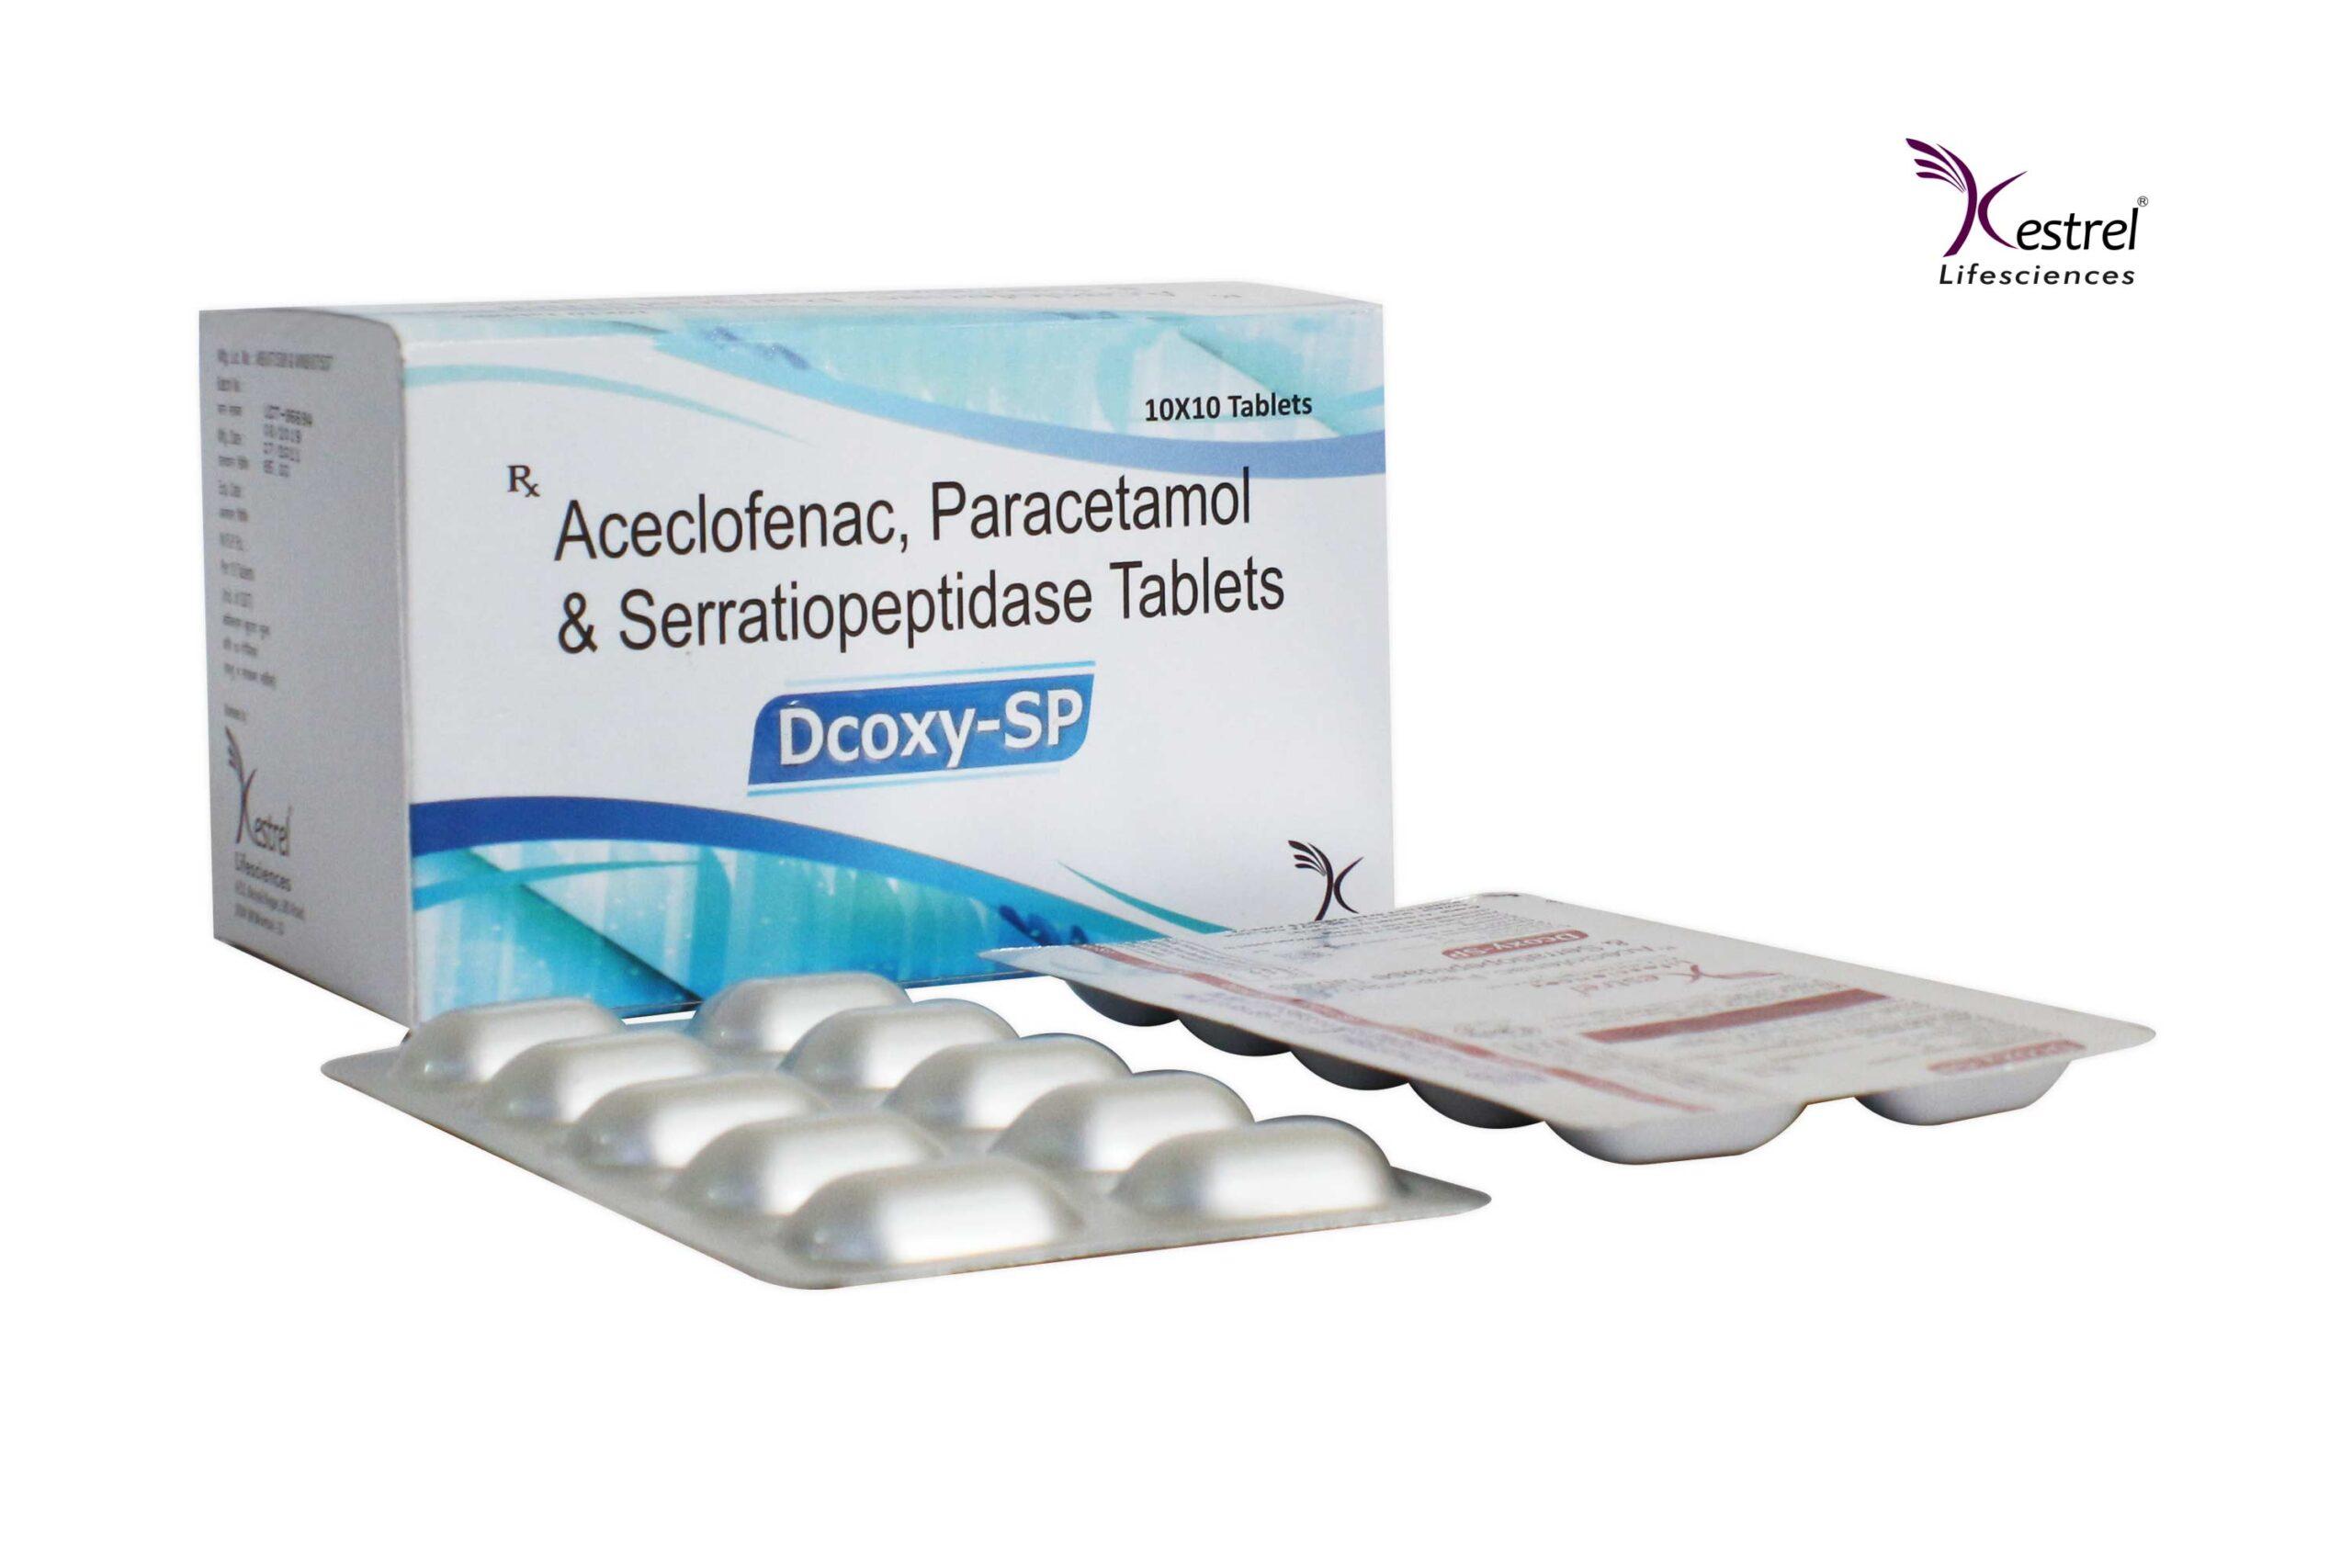 Dcoxy-SP